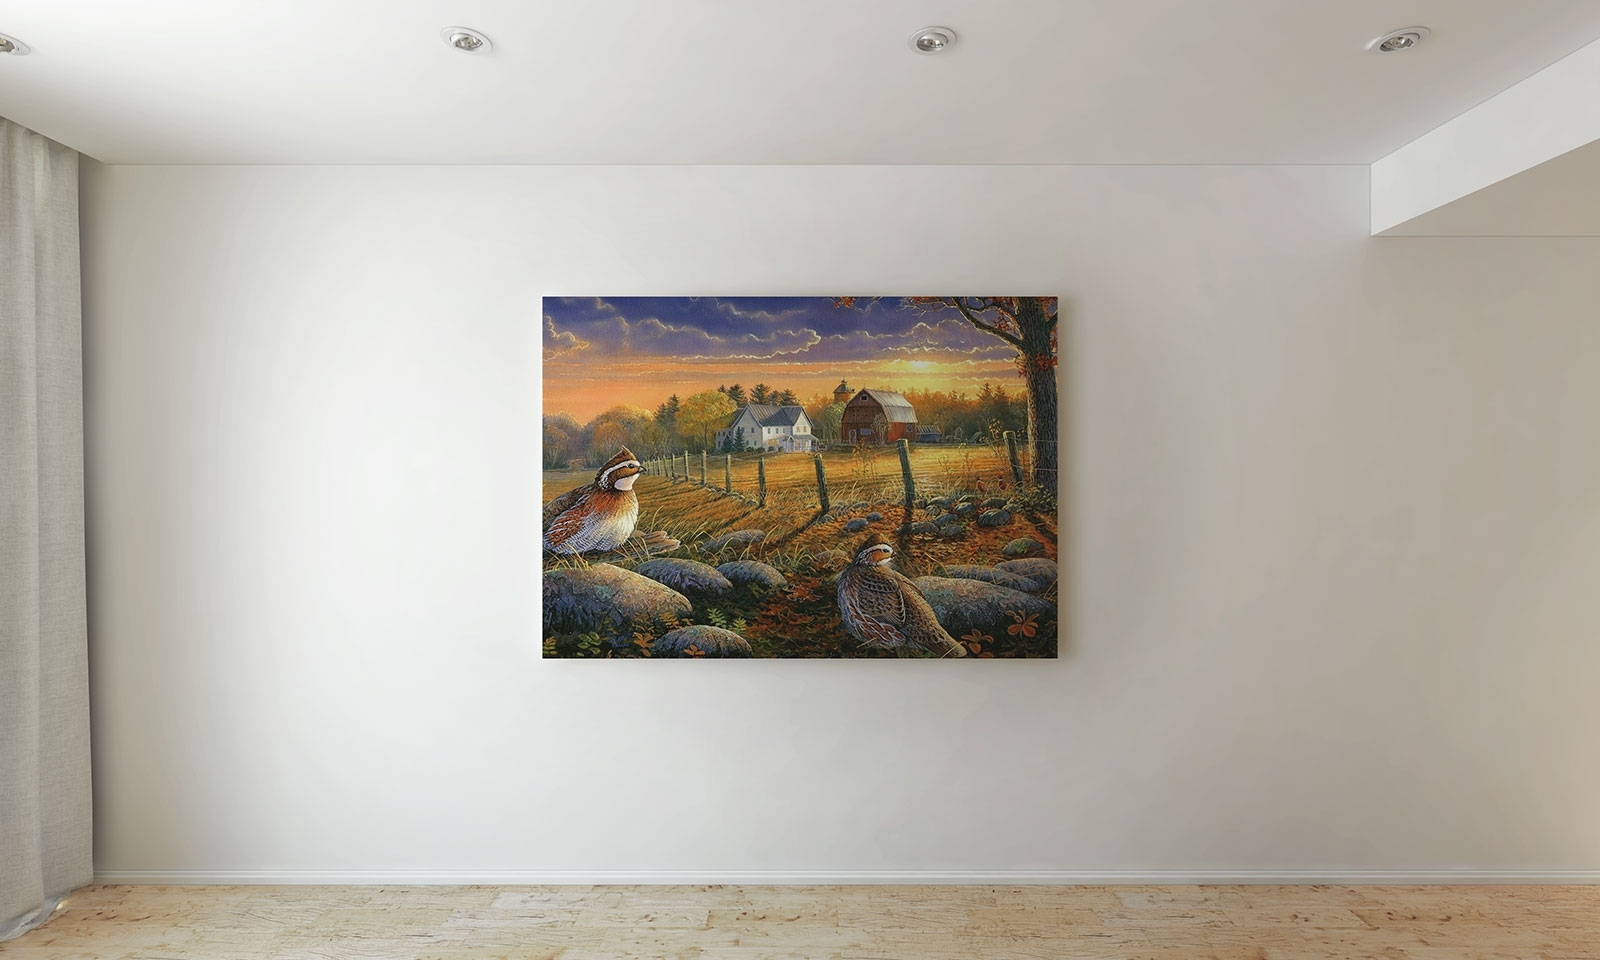 Free Wall Painting Canvas / Photo Frame Mockup Psd – Good Mockups Regarding Current Mockup Canvas Wall Art (View 10 of 15)